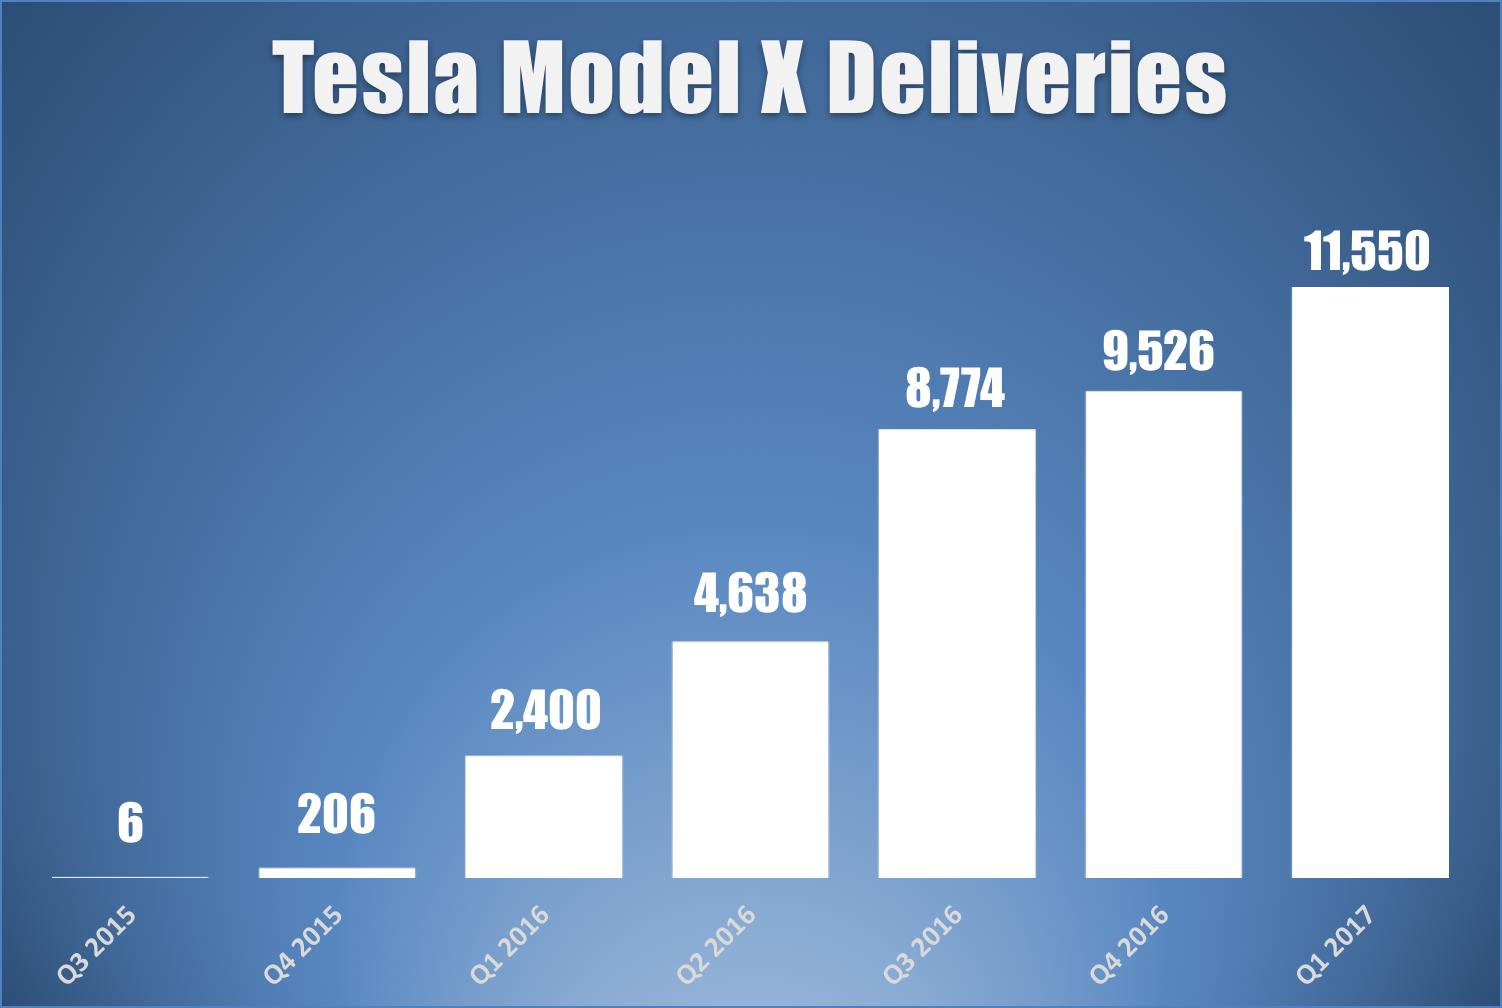 Bar chart showing Tesla's Model X deliveries since Q3 2015.